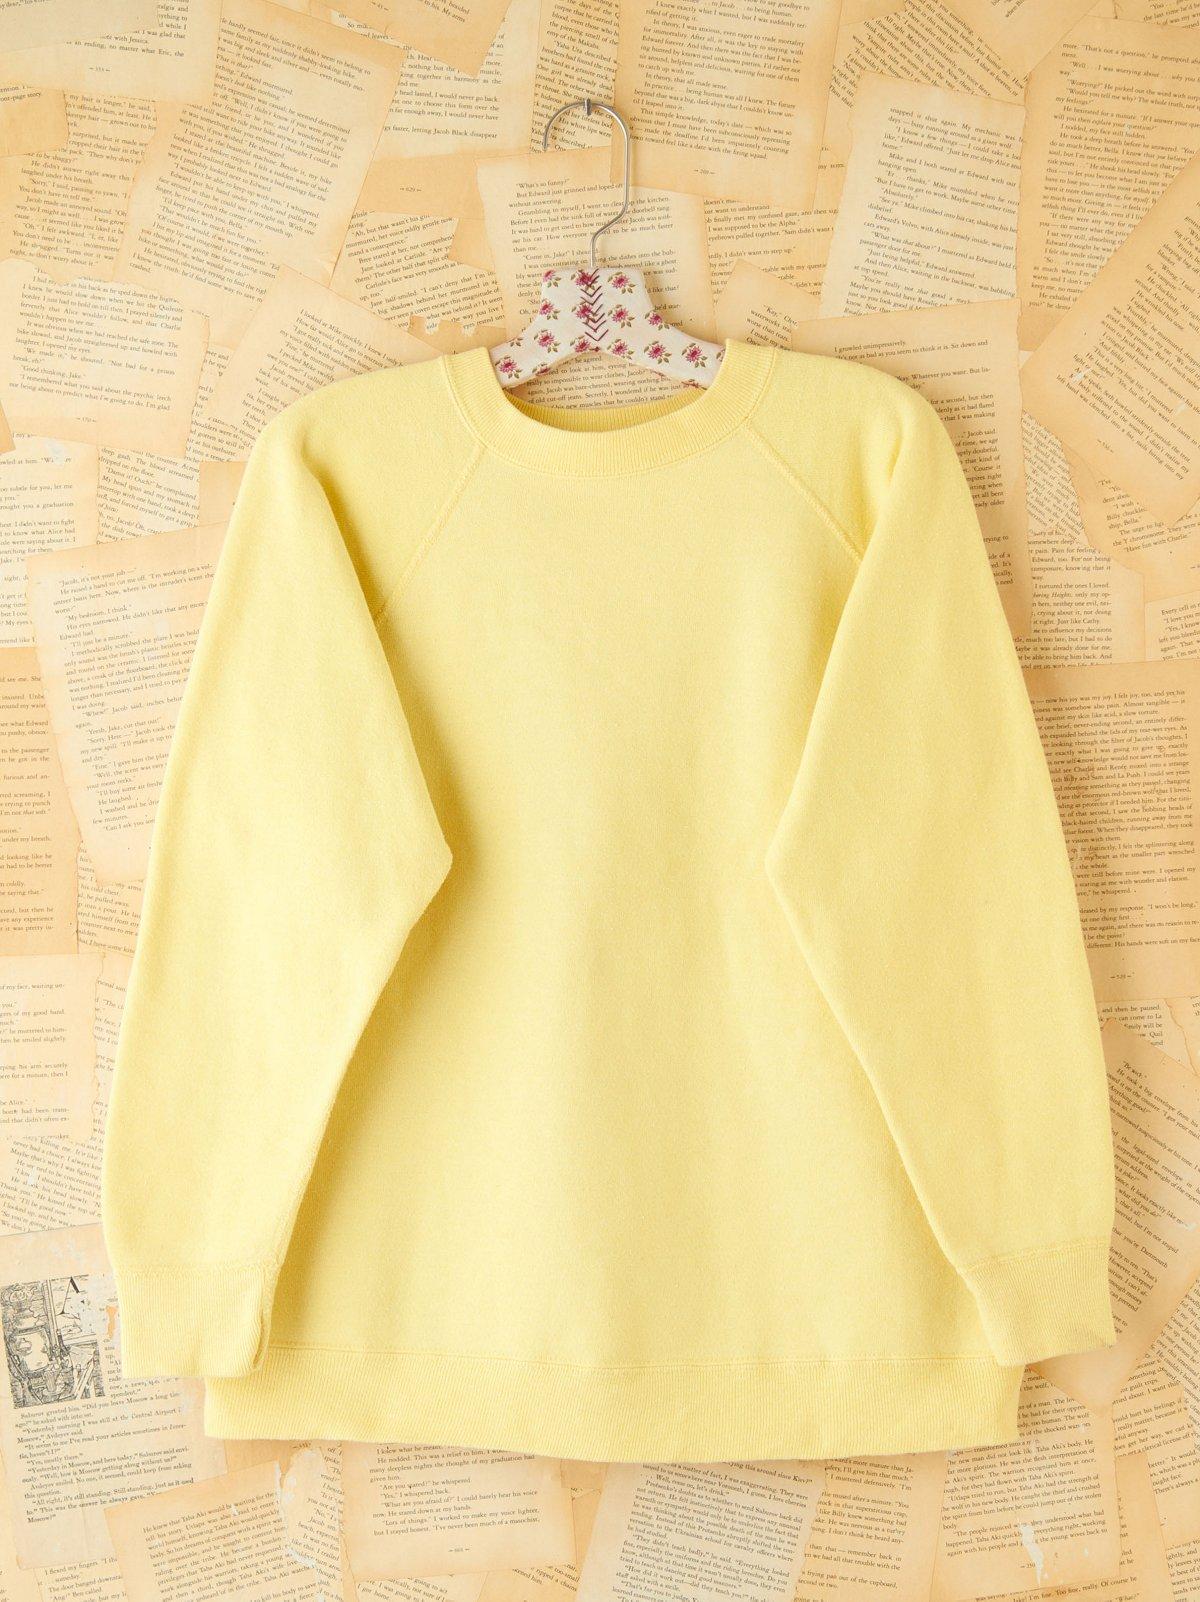 Vintage Yellow Pullover Sweatshirt